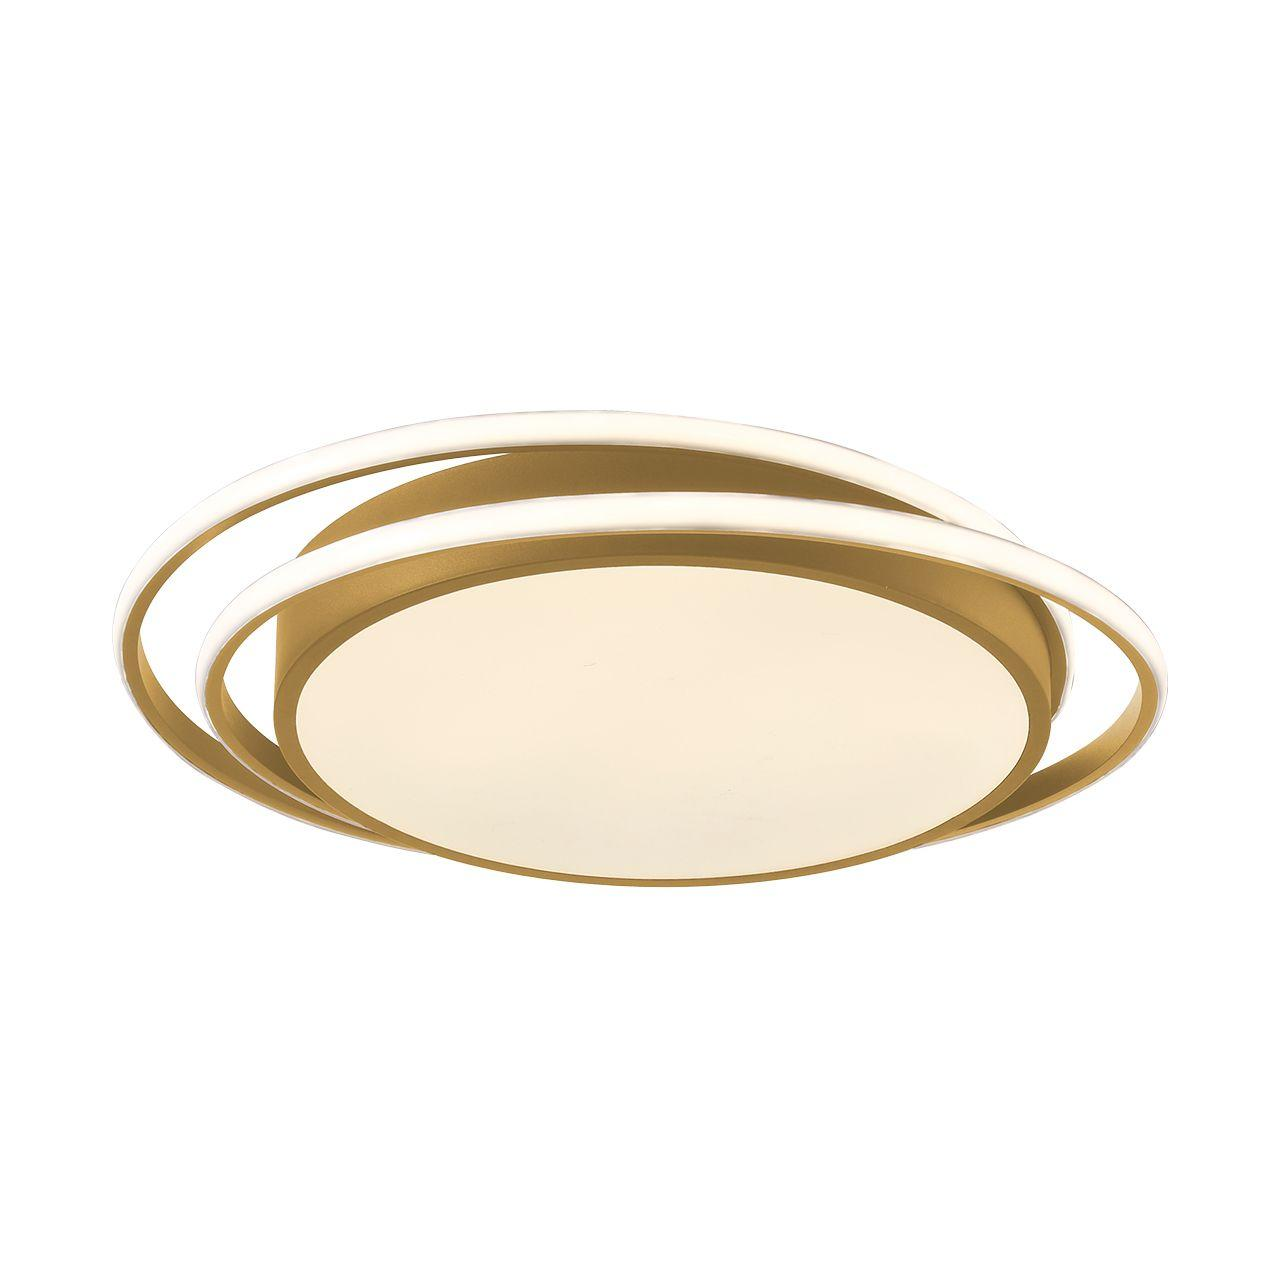 Plafón Led Oro 60 cm Kansas Circular